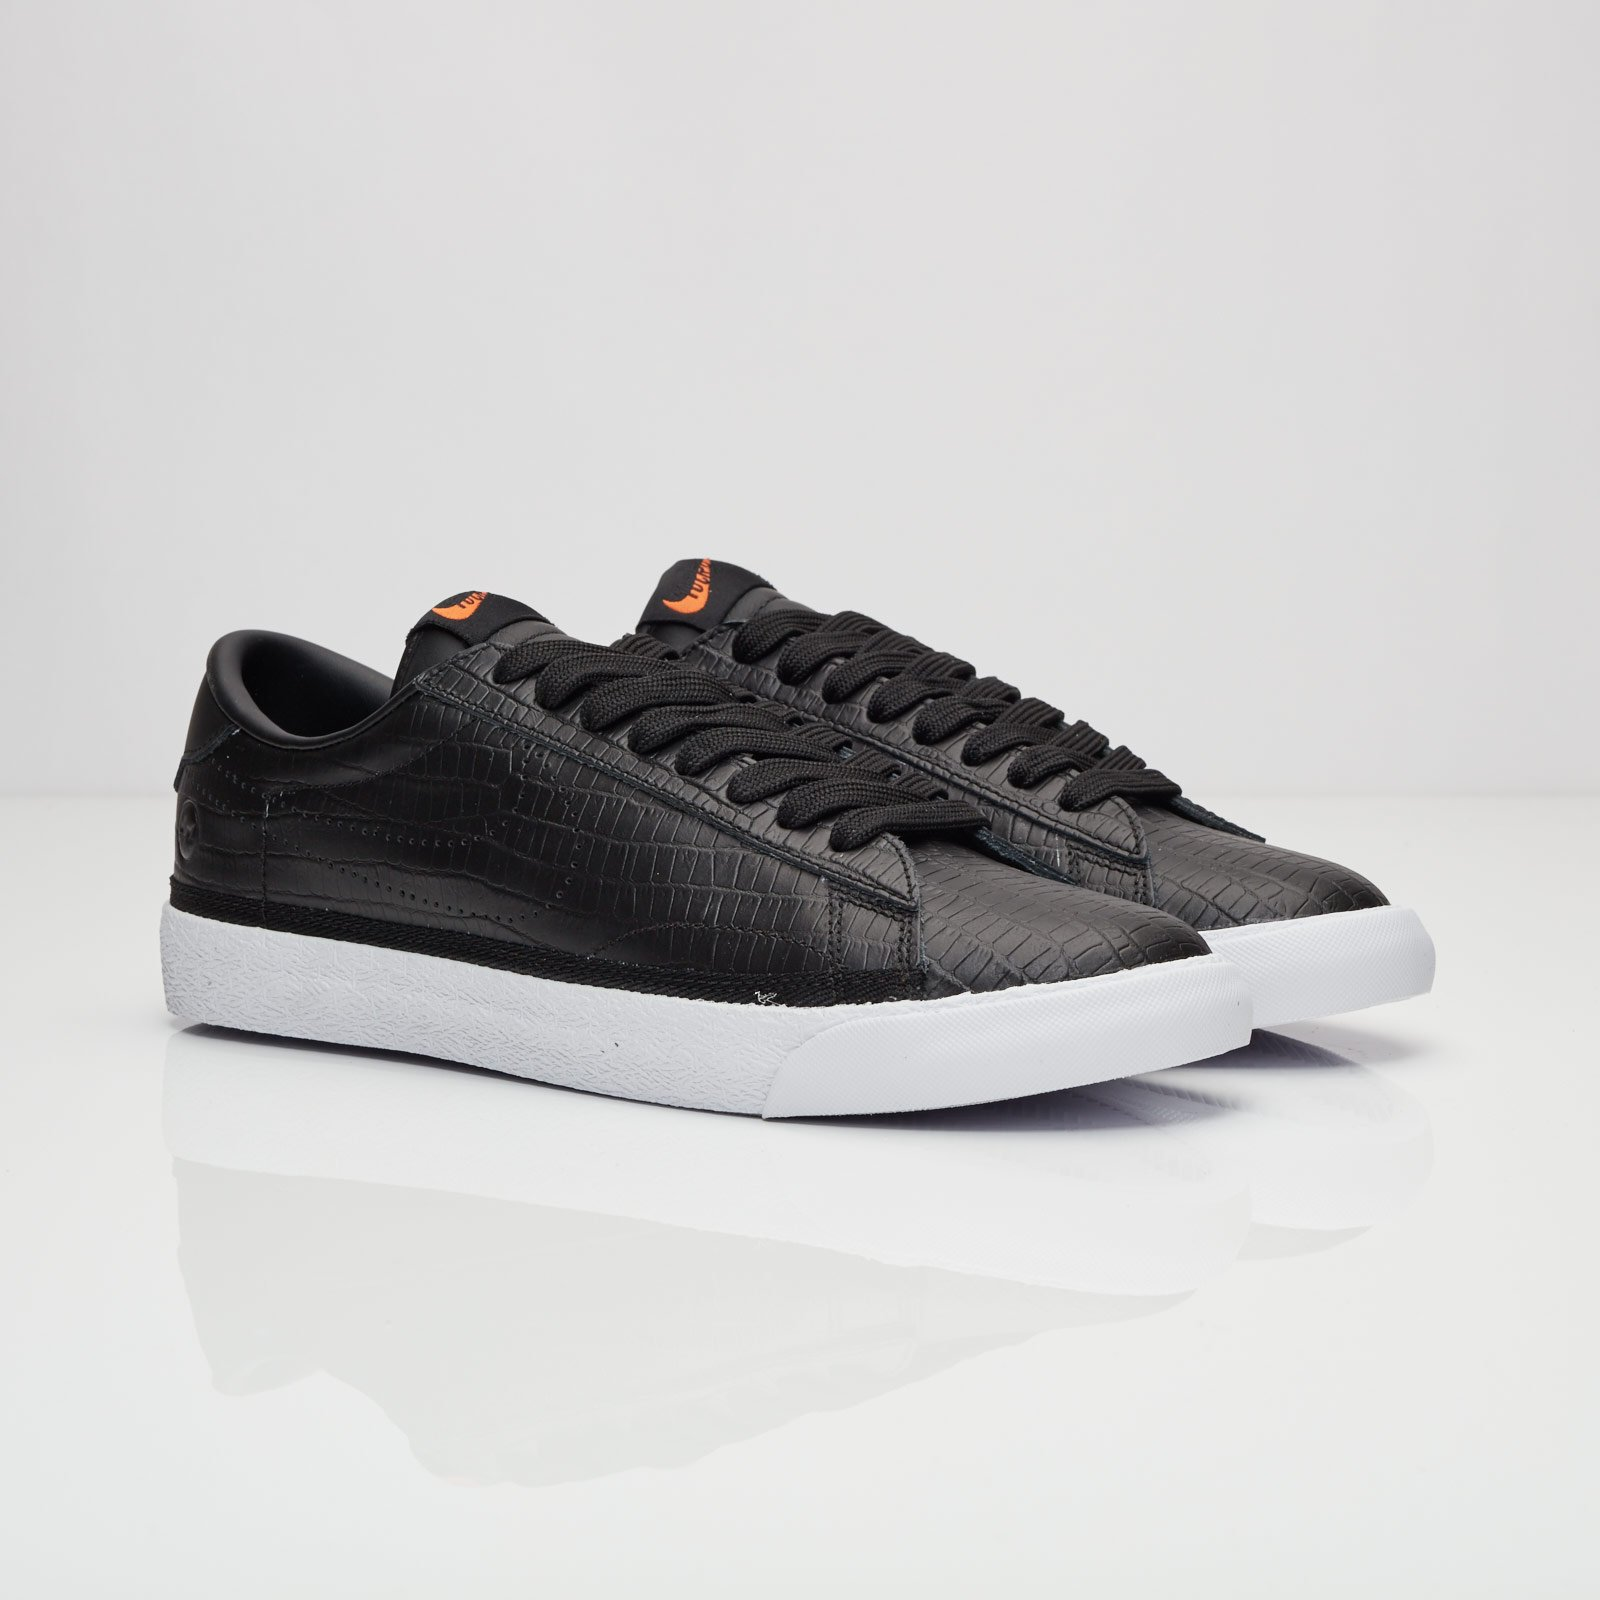 Nike Air Zoom Tennis Classic AC   Fragment - 857953-001 ... 0a7cf57f2